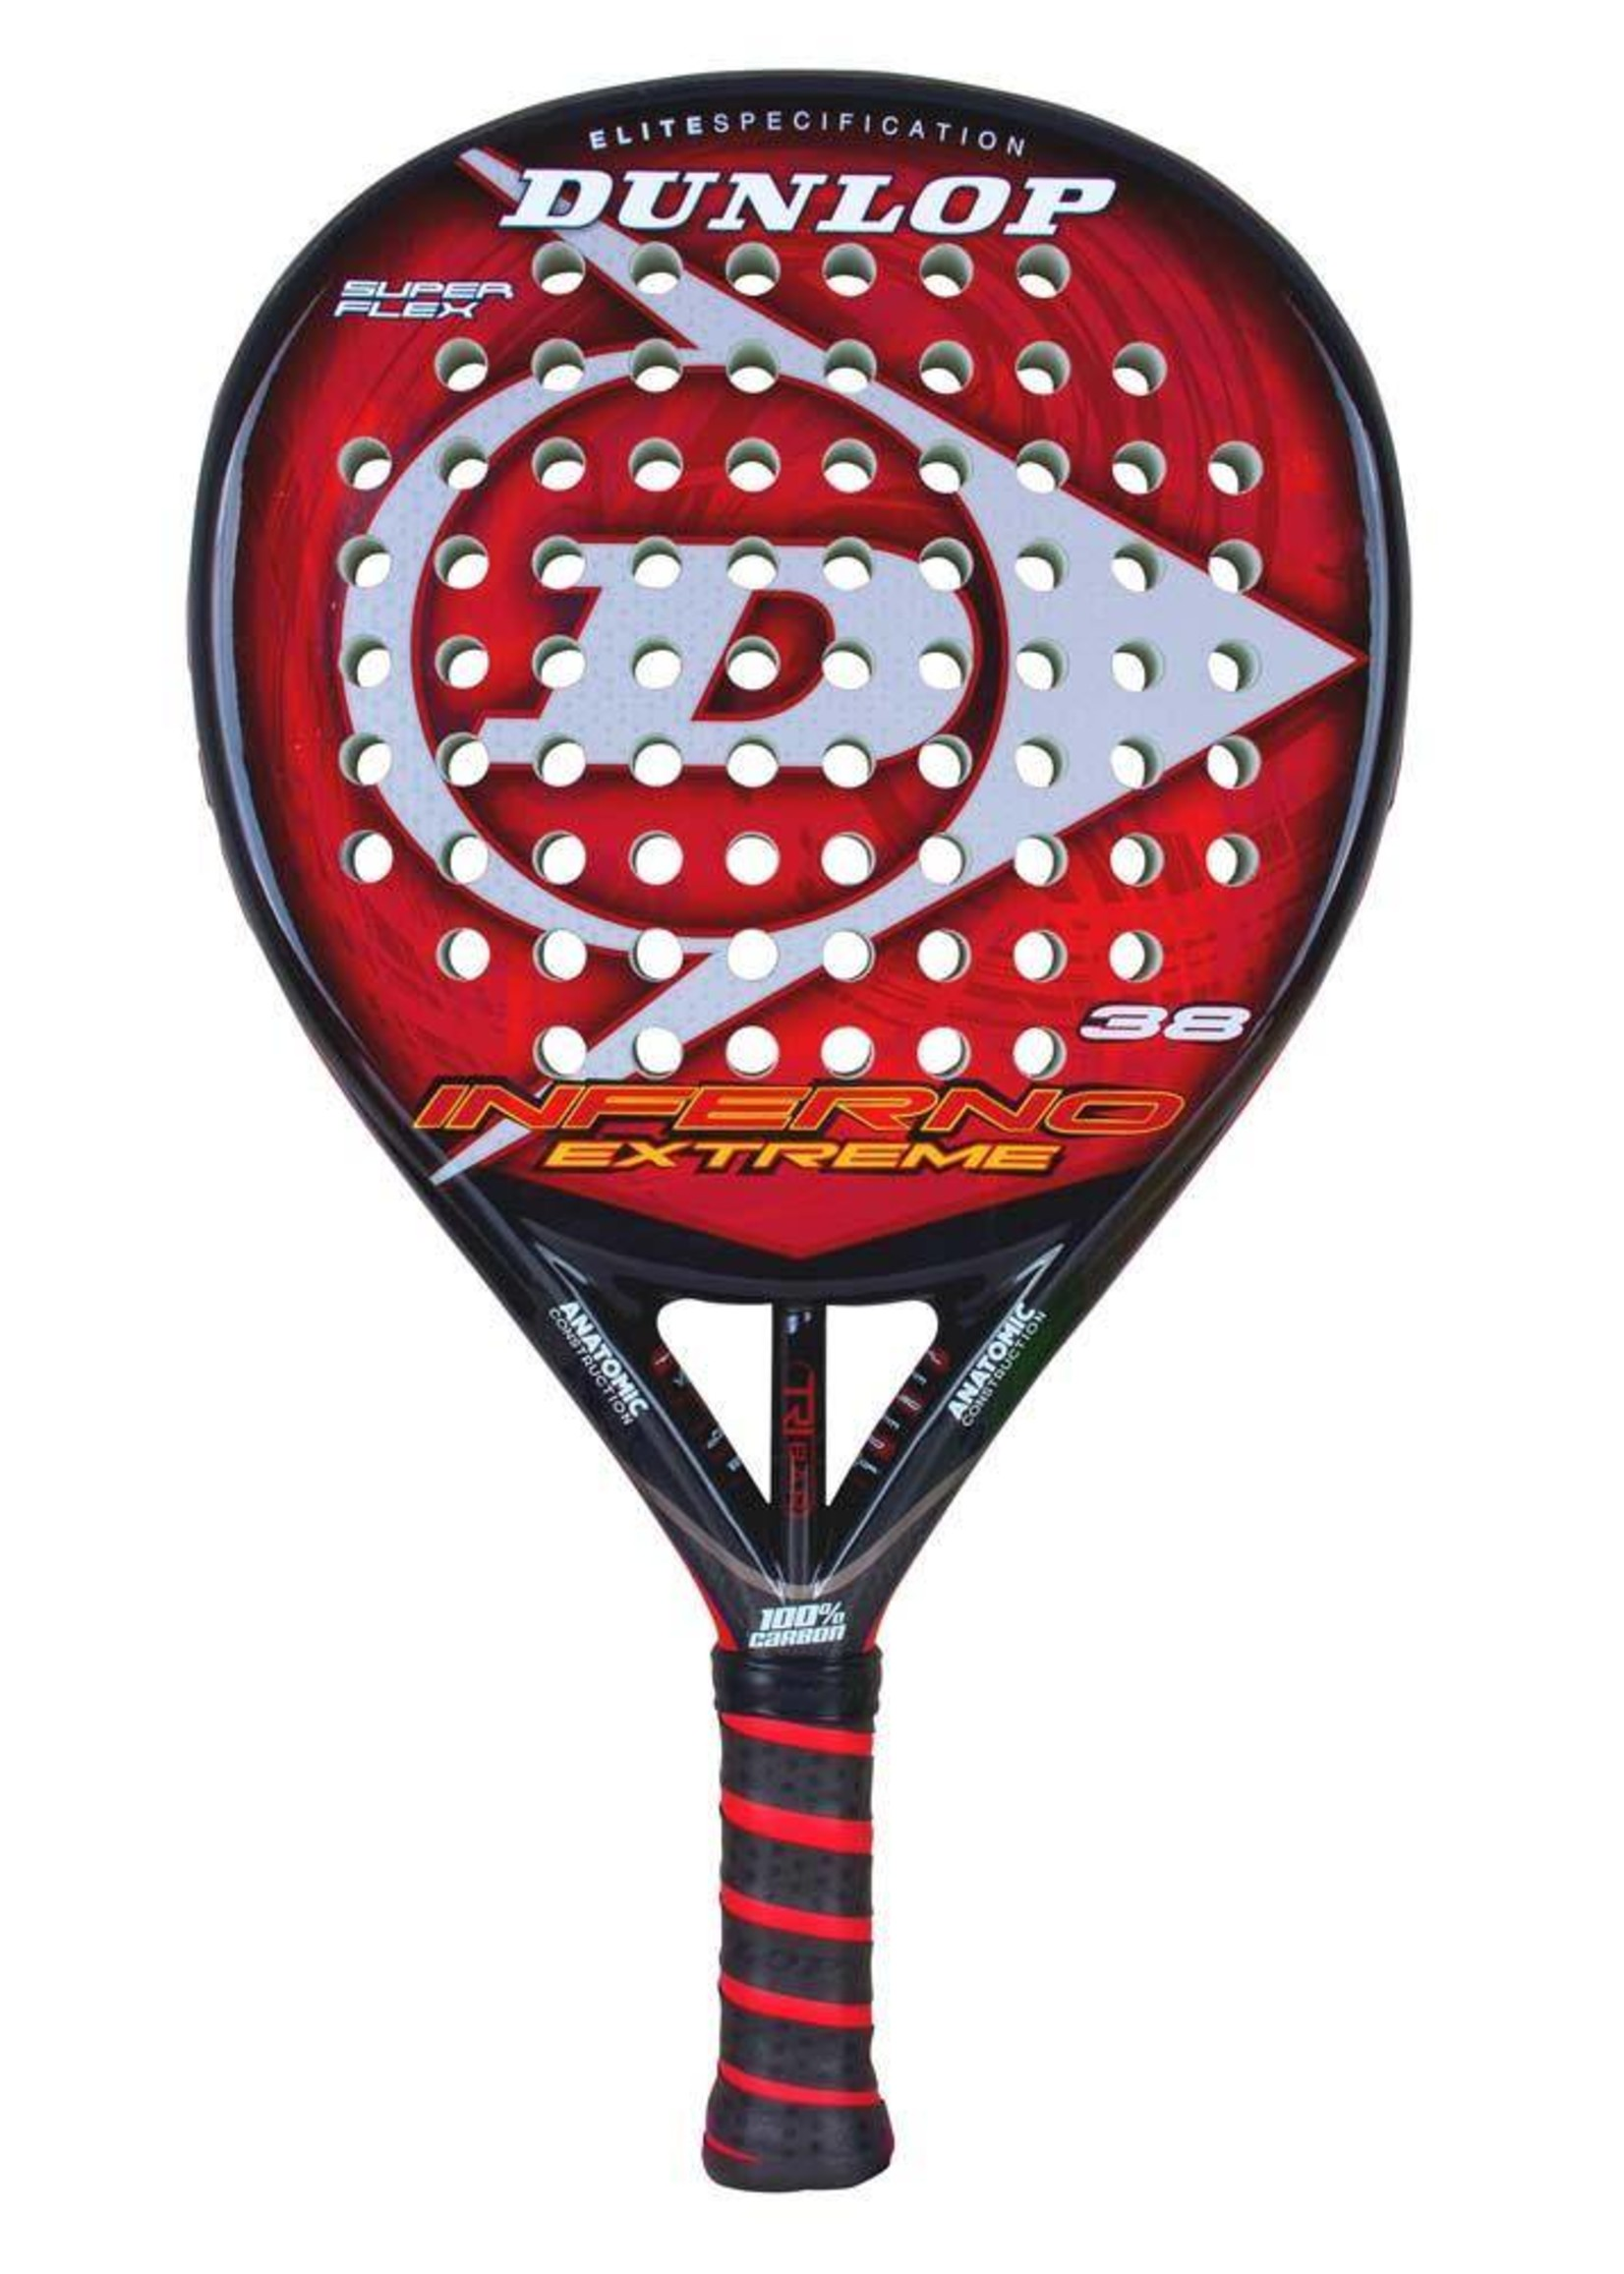 Dunlop Dunlop Sport Padel Racket Inferno Extreme, G0